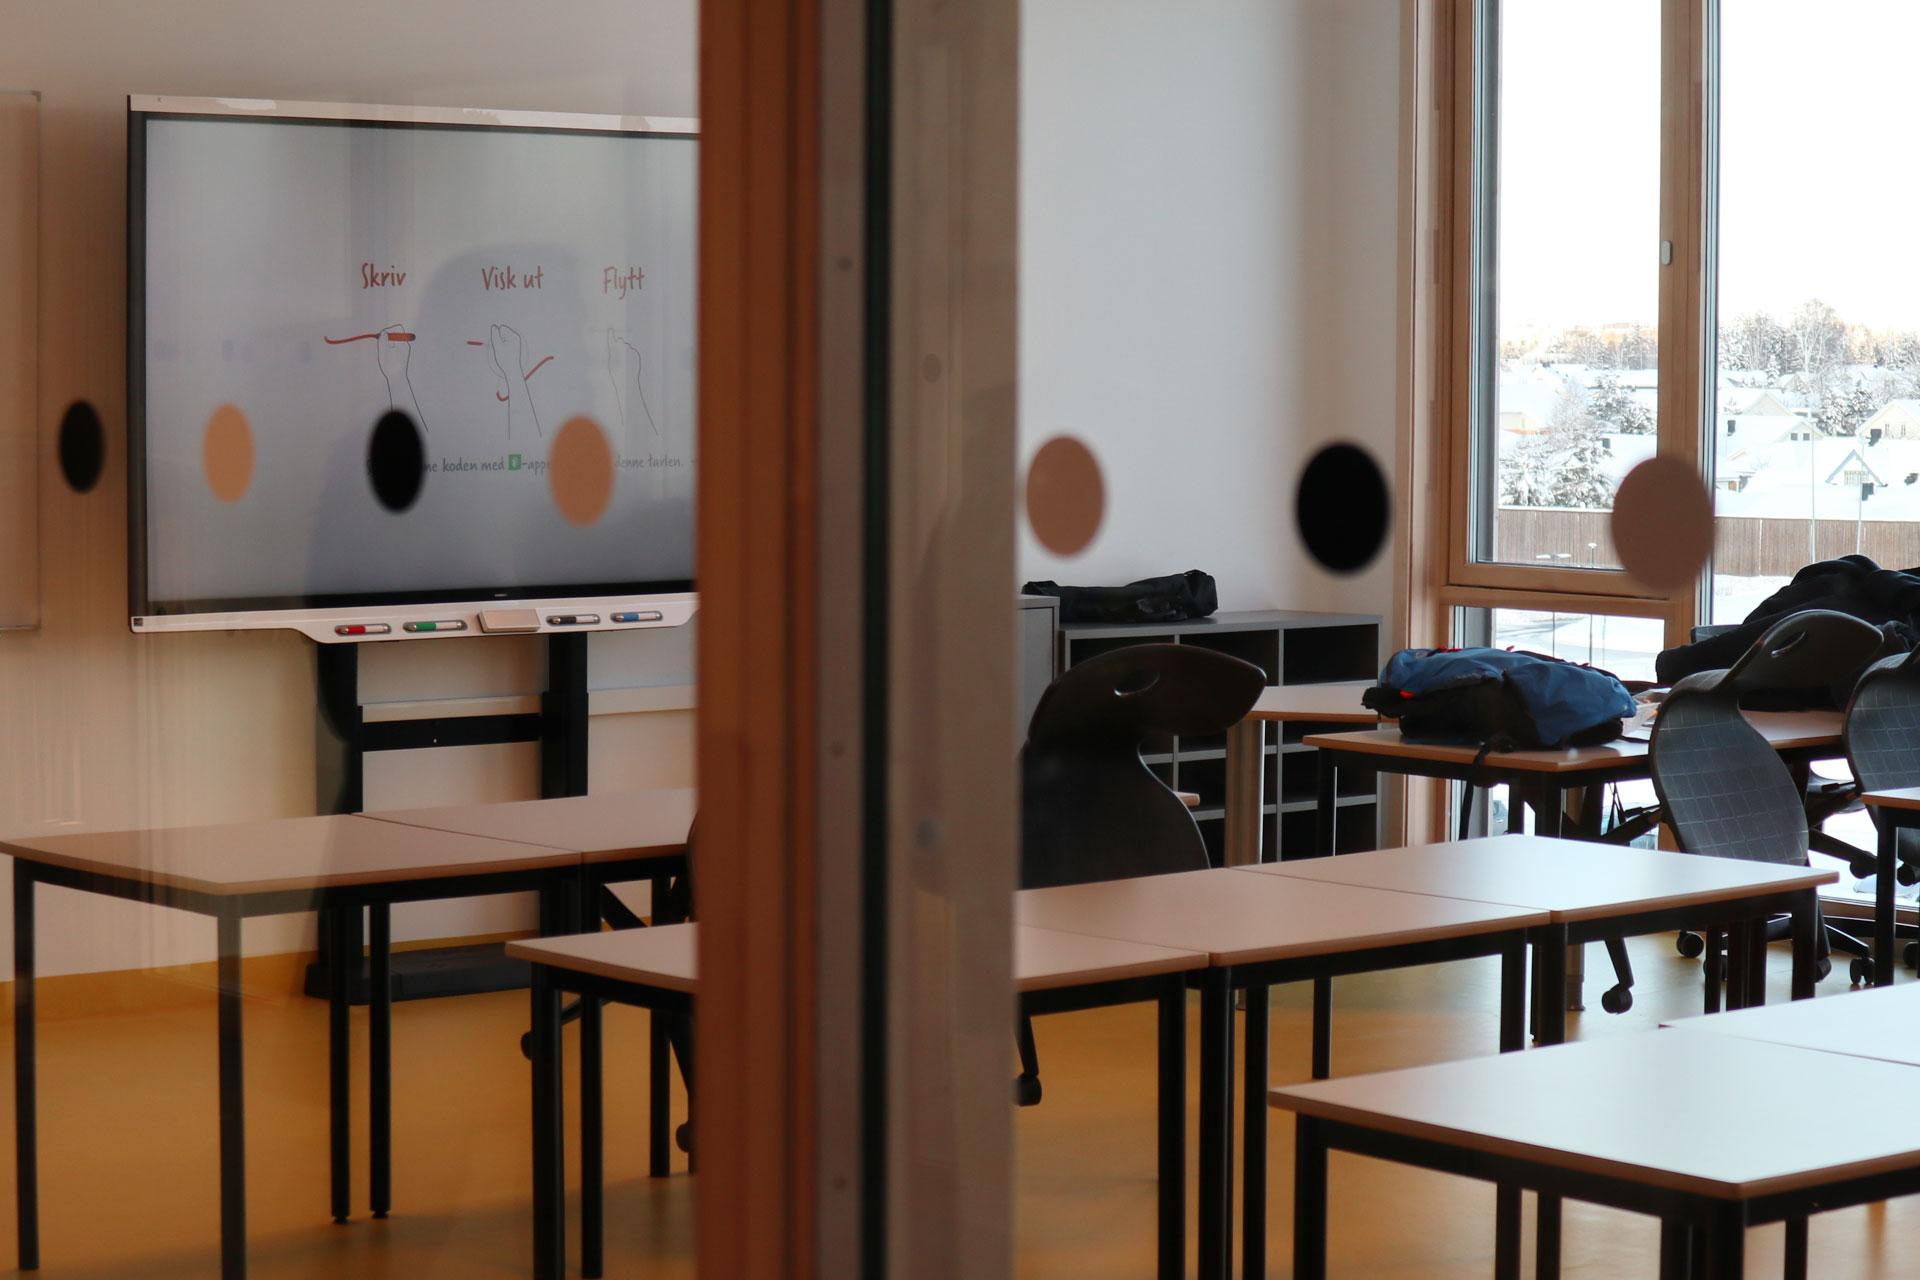 Artikkel Smart board moderne avansert gystadmarka ungdomsskole